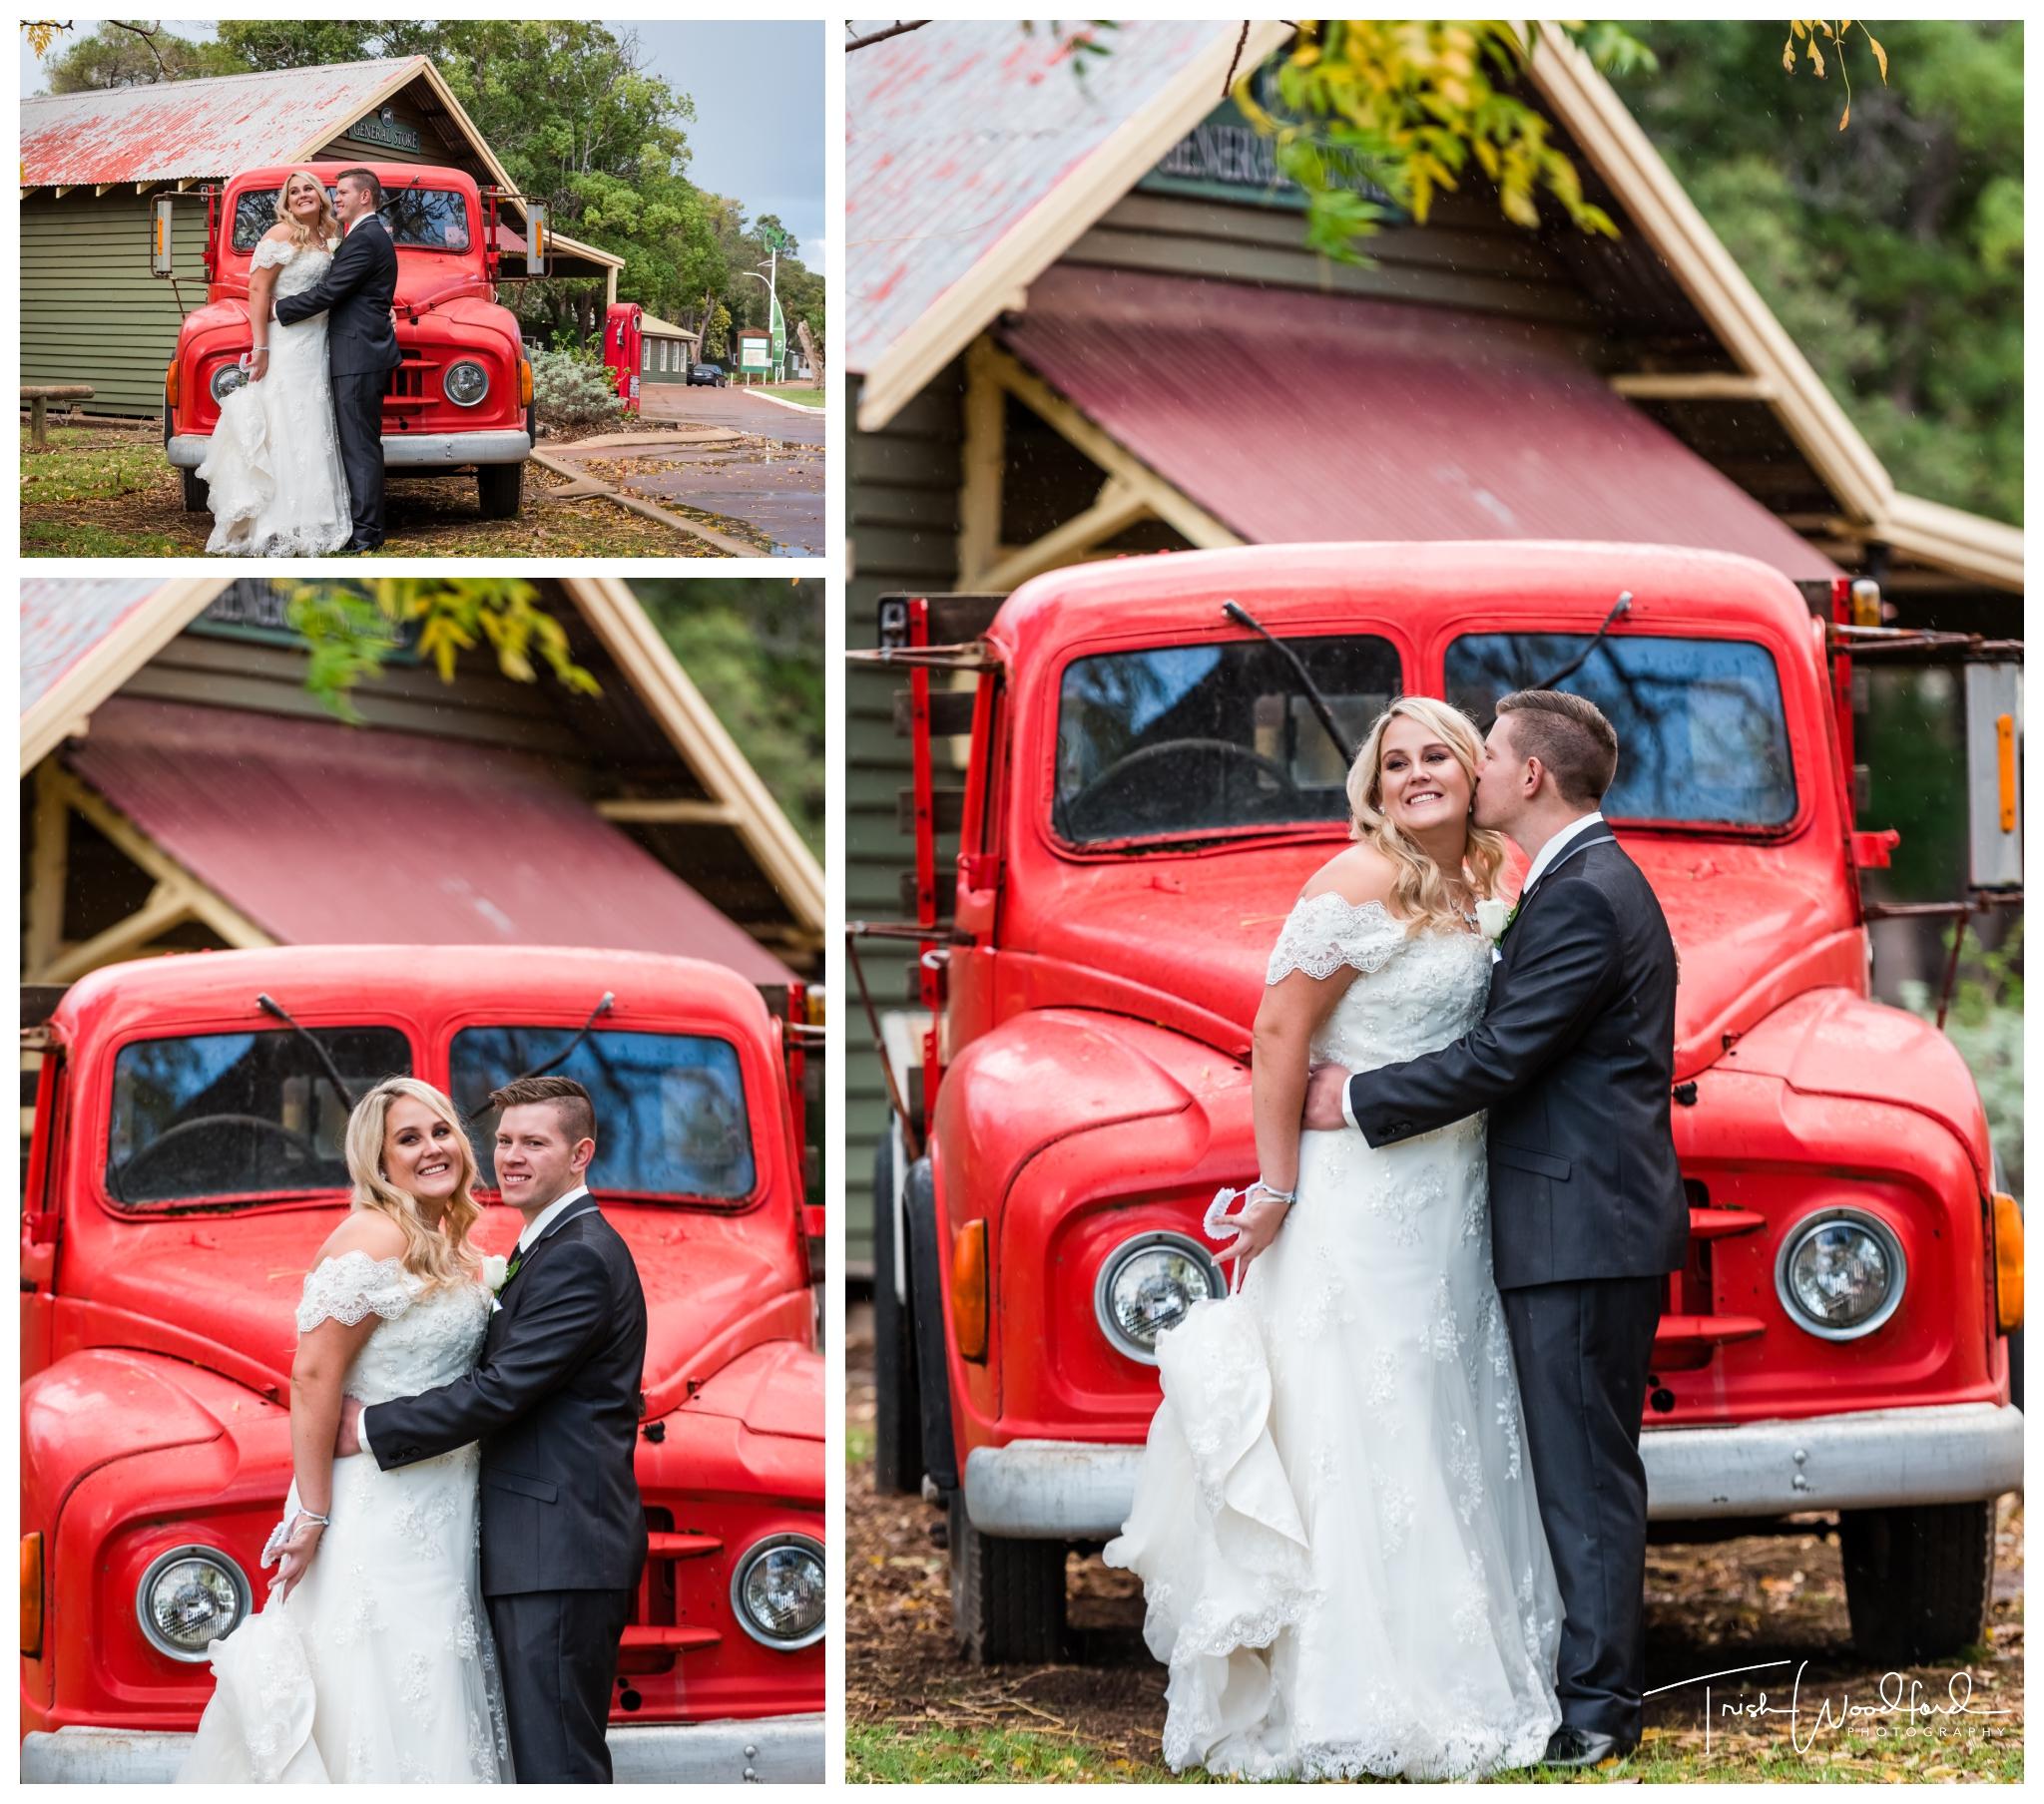 fairbridge-bride-groom-wedding